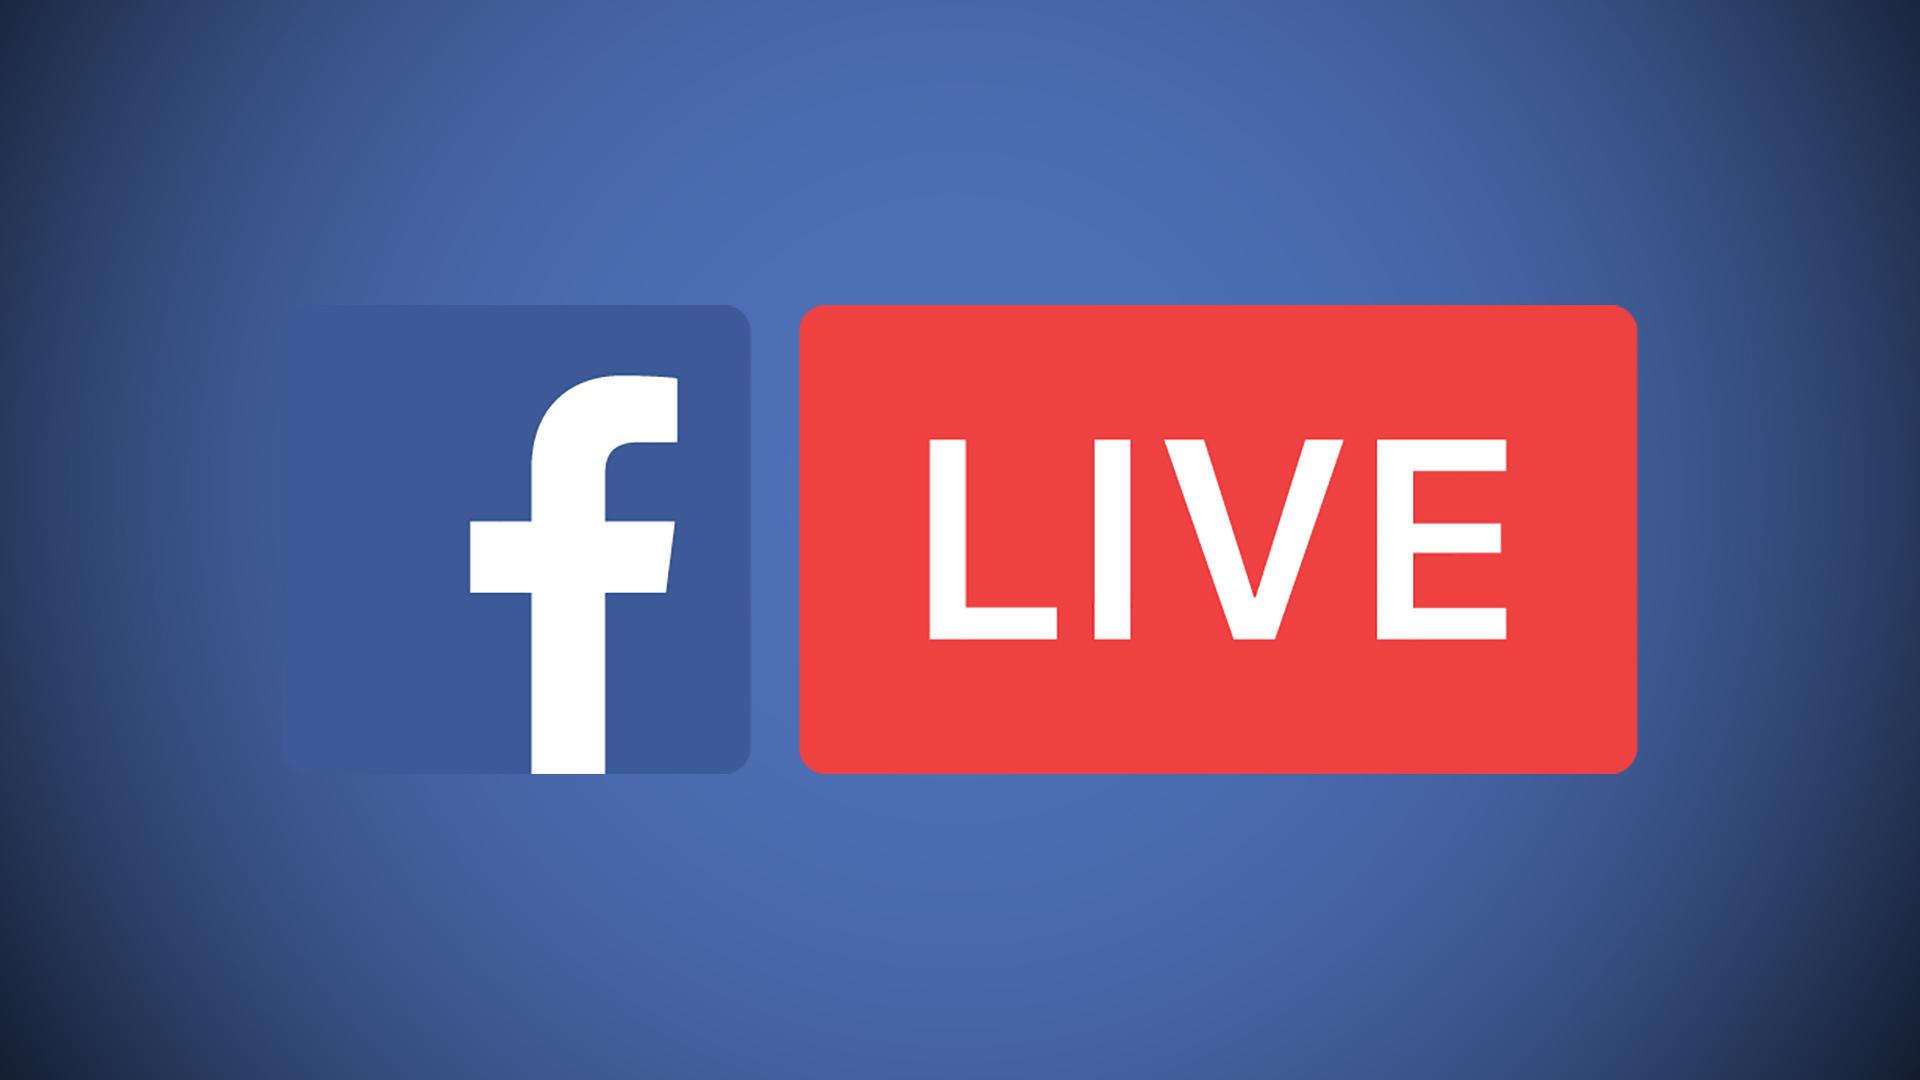 facebook, mark zuckerberg, live video